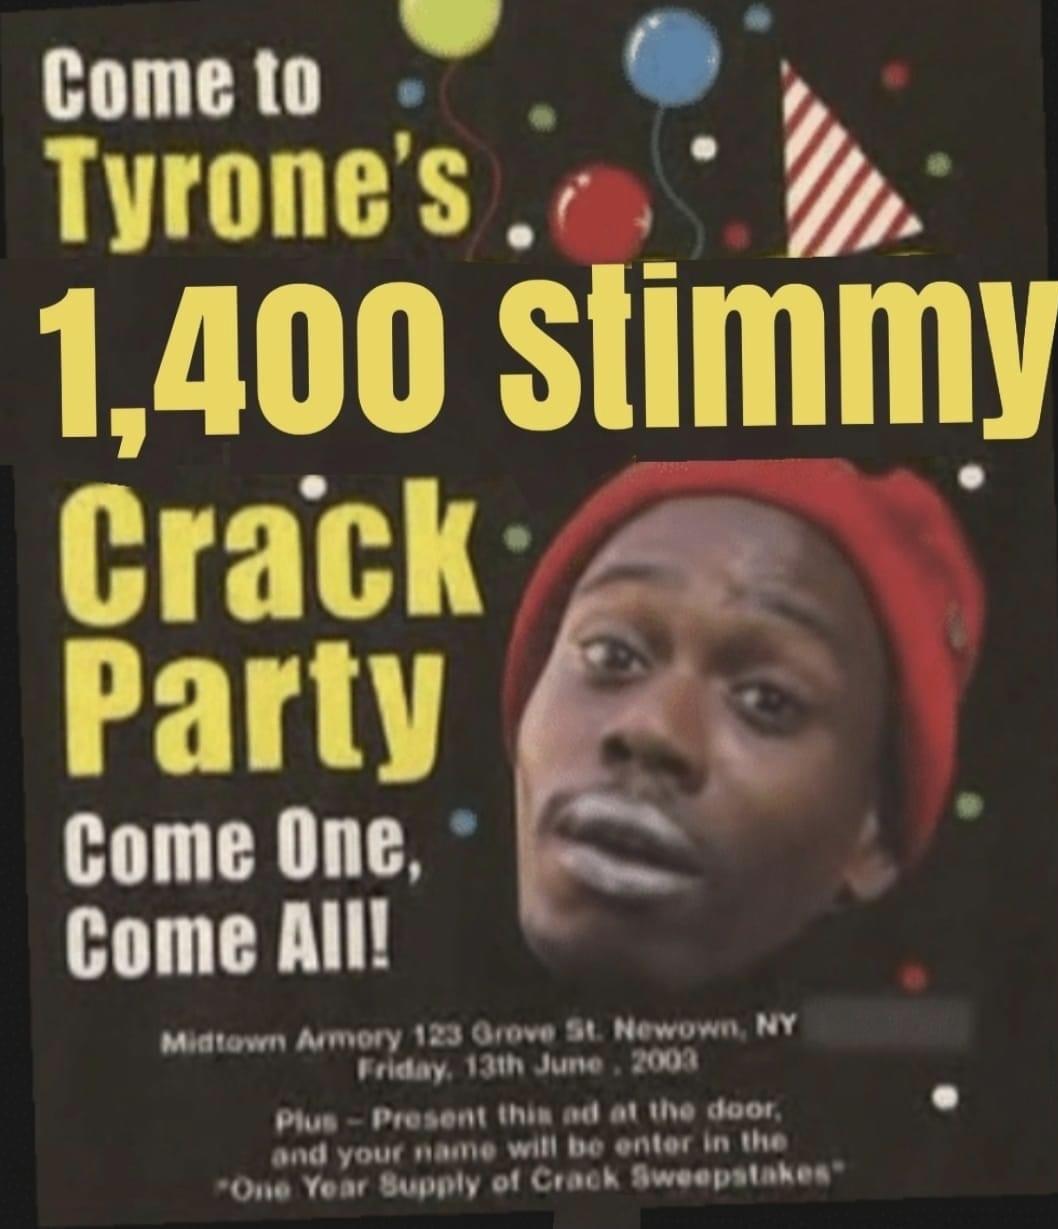 Tyrone has the best crack parties - meme